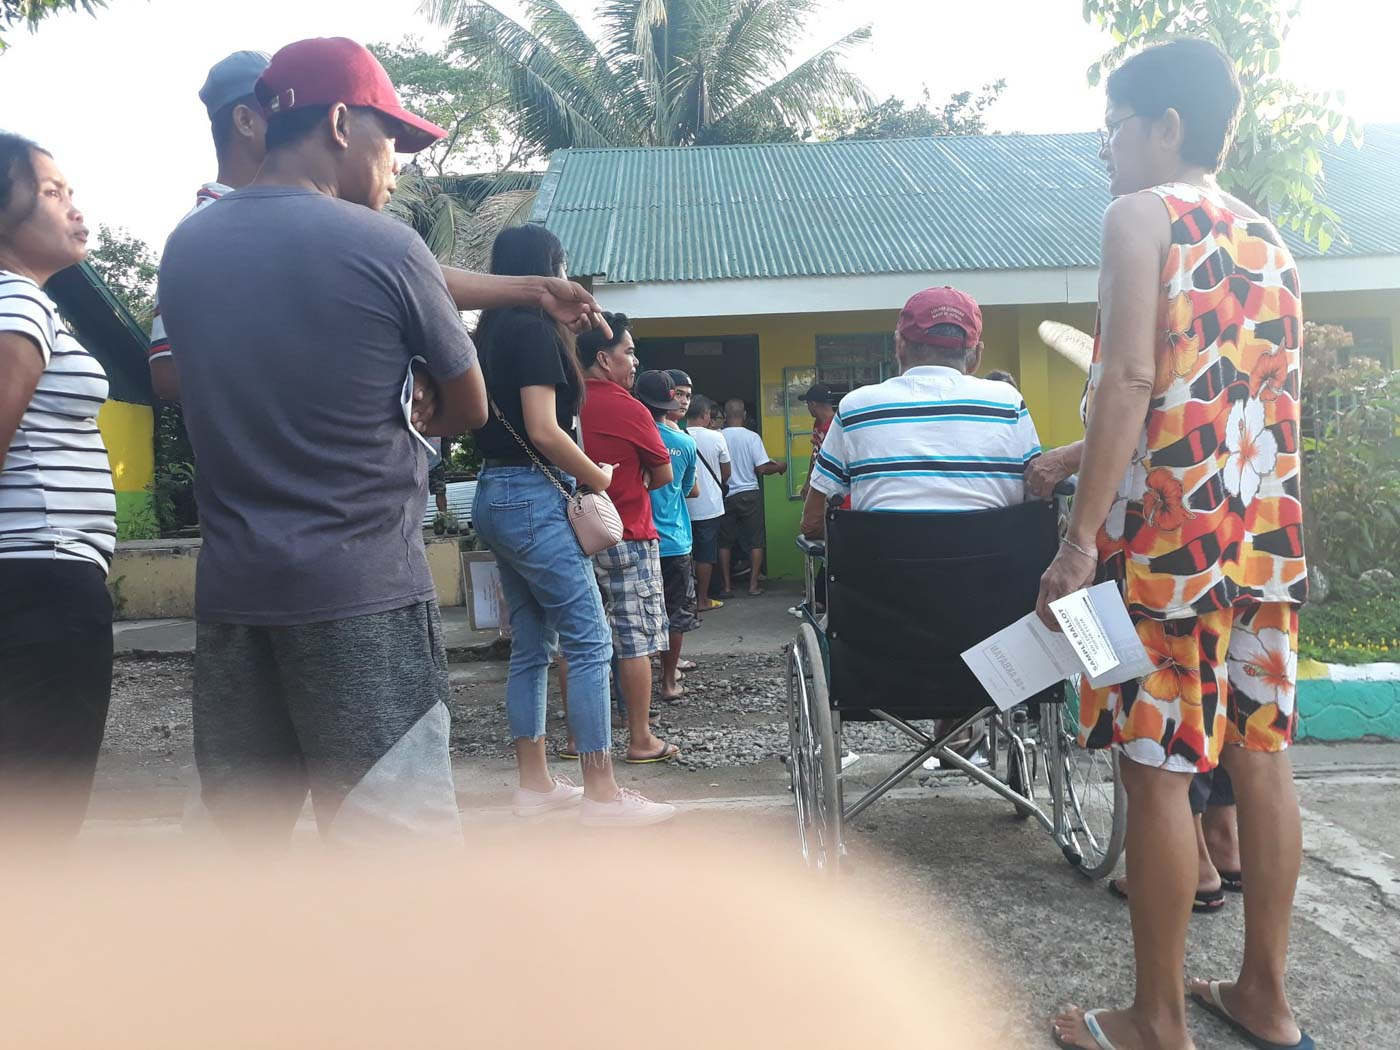 NUEVA ECIJA. PWDs and senior citizens wait in long lines to cast their votes at Nieves Elementary School in San Leonardo, Nueva Ecija. Photo by Jhon Oliver Nery/Rappler